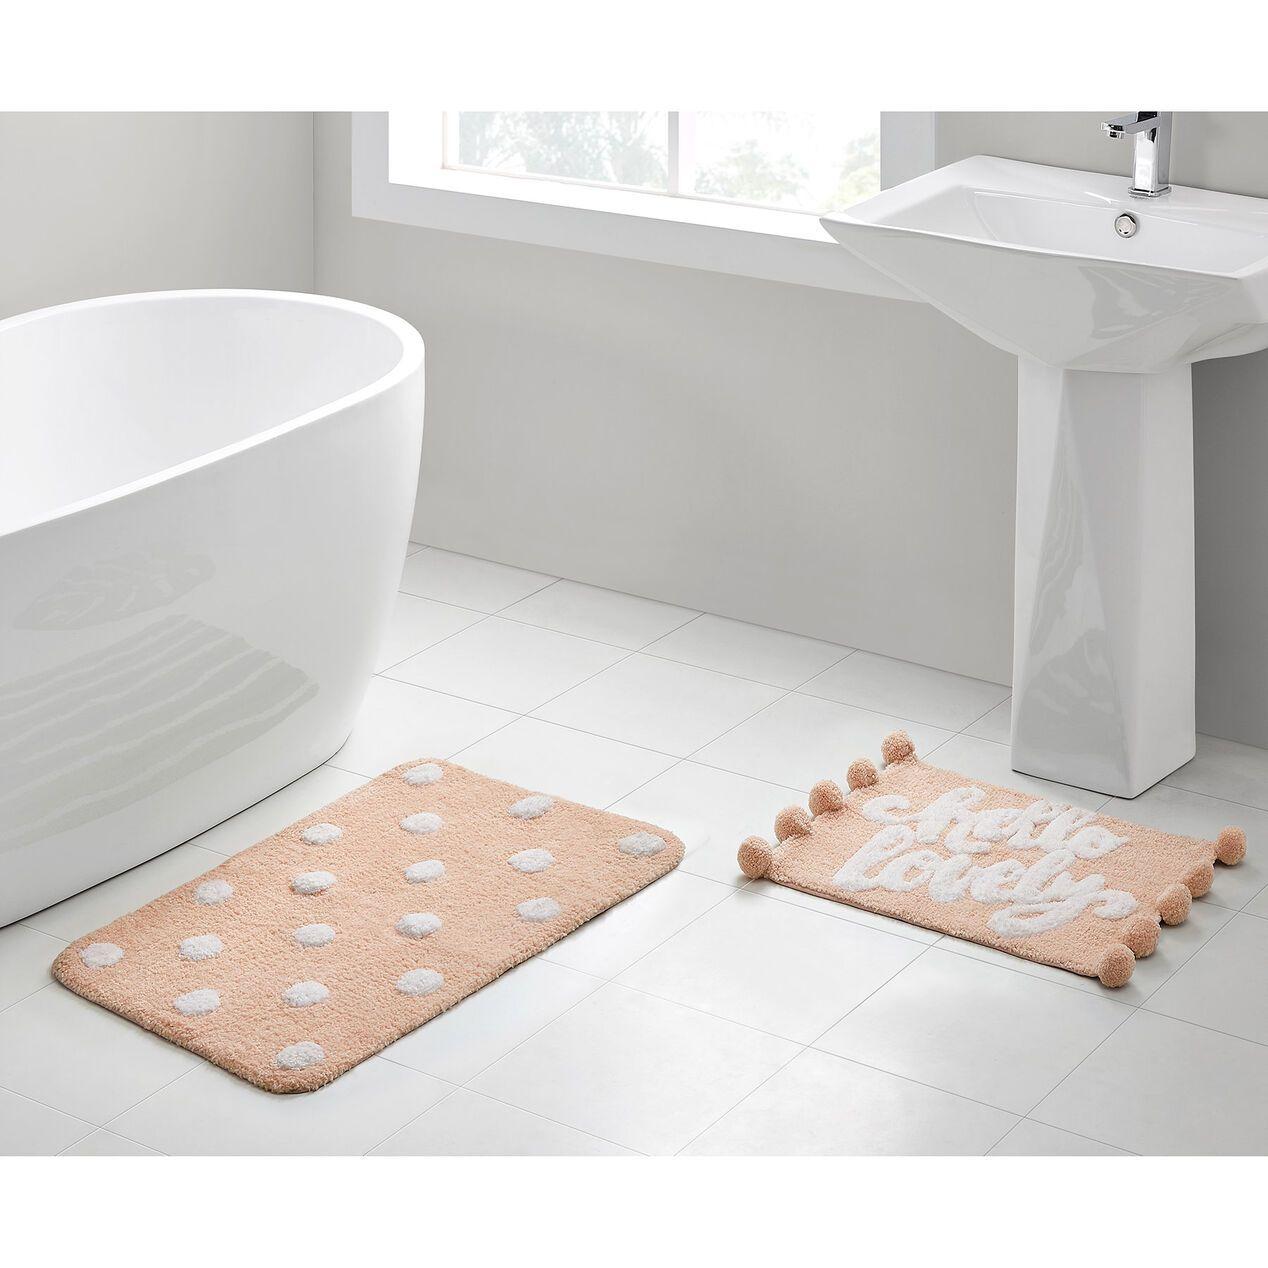 Hello Lovely 2pc Rug Set Pink In 2020 Bathroom Rugs Cute Bath Mats Bath Rugs Sets [ 1268 x 1268 Pixel ]